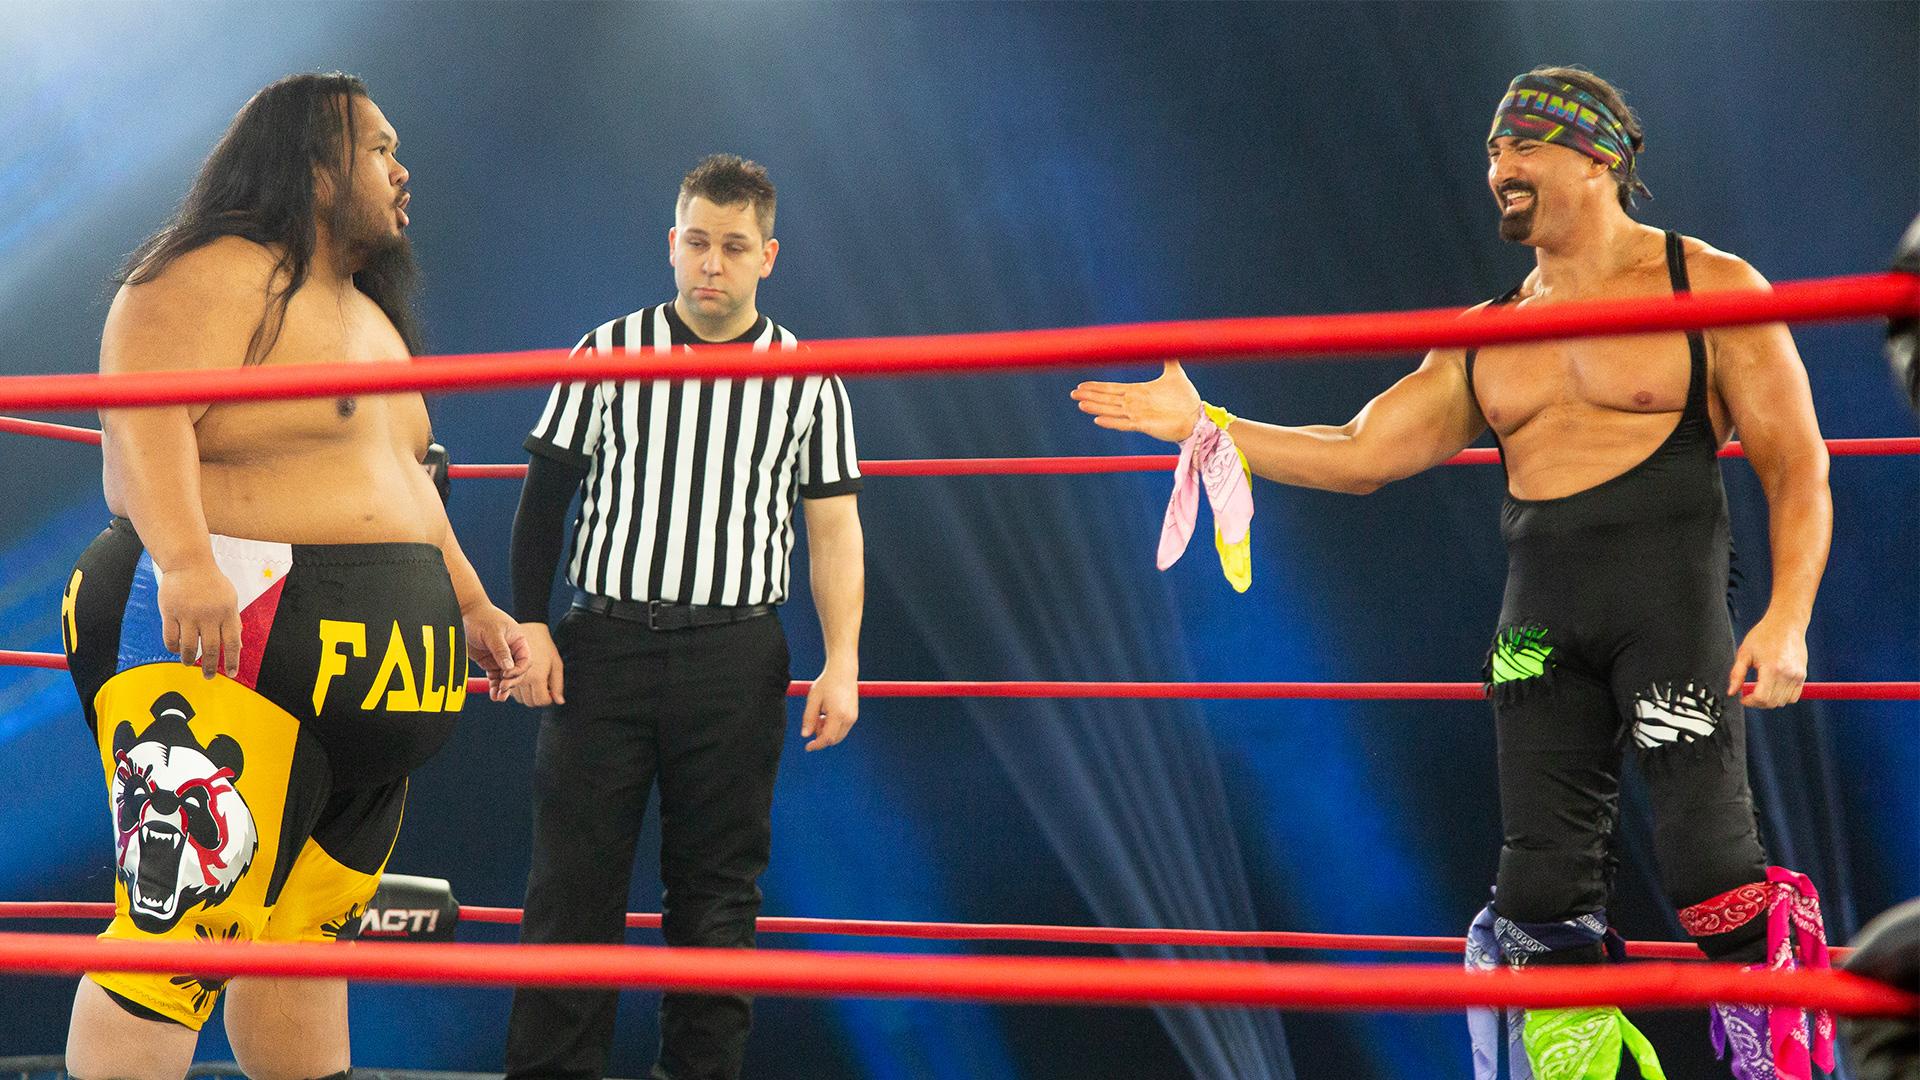 Johnny Swinger Sends Fallah Bahh for a Ride on BTI – IMPACT Wrestling